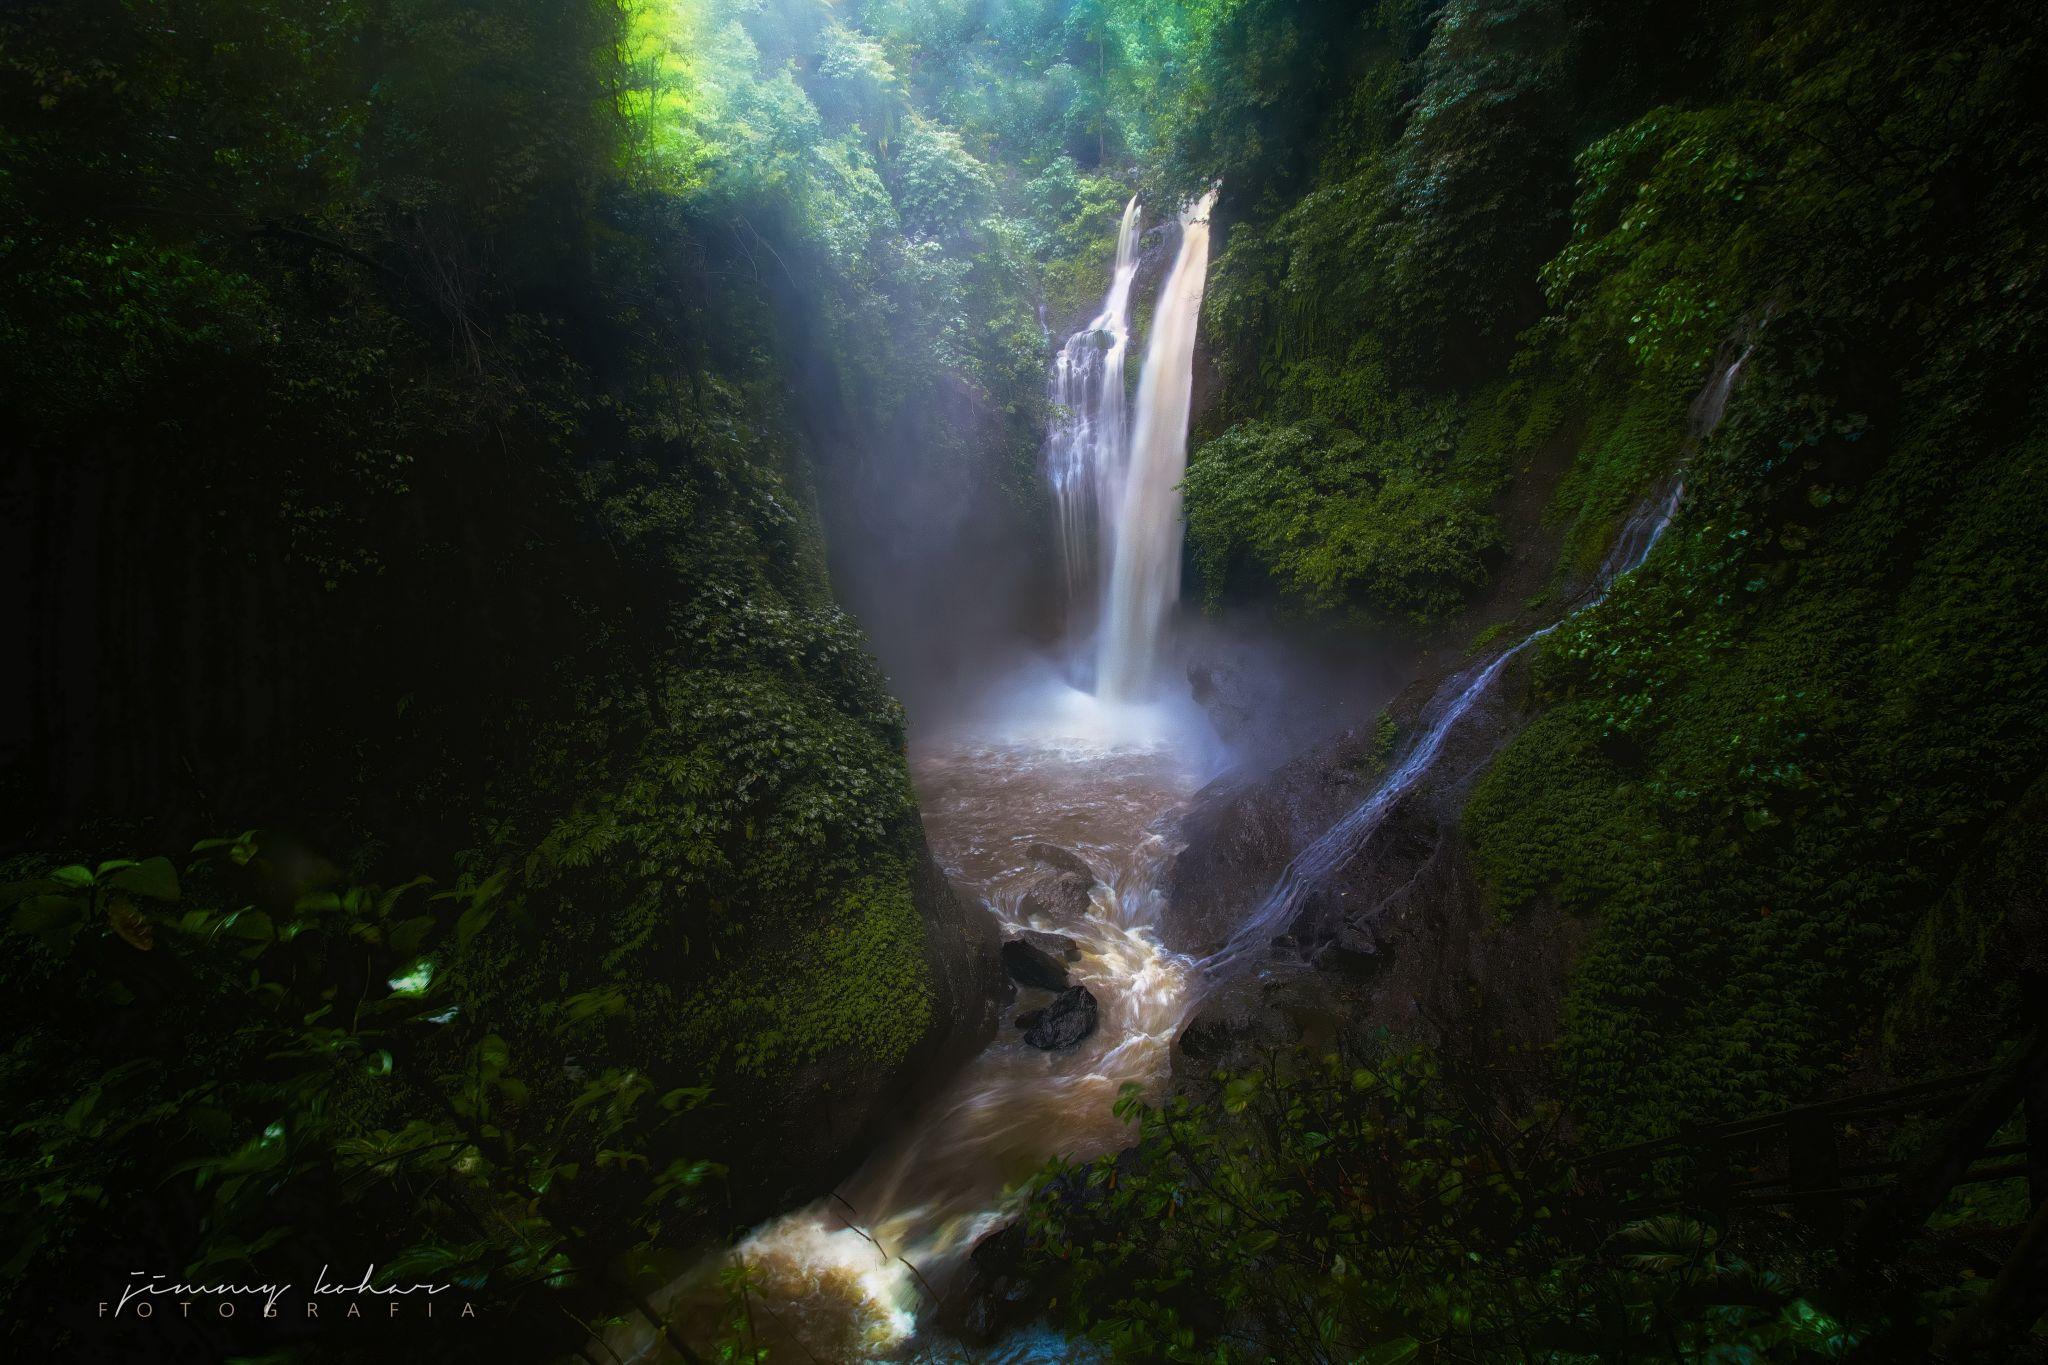 Aling-Aling Waterfall, Indonesia